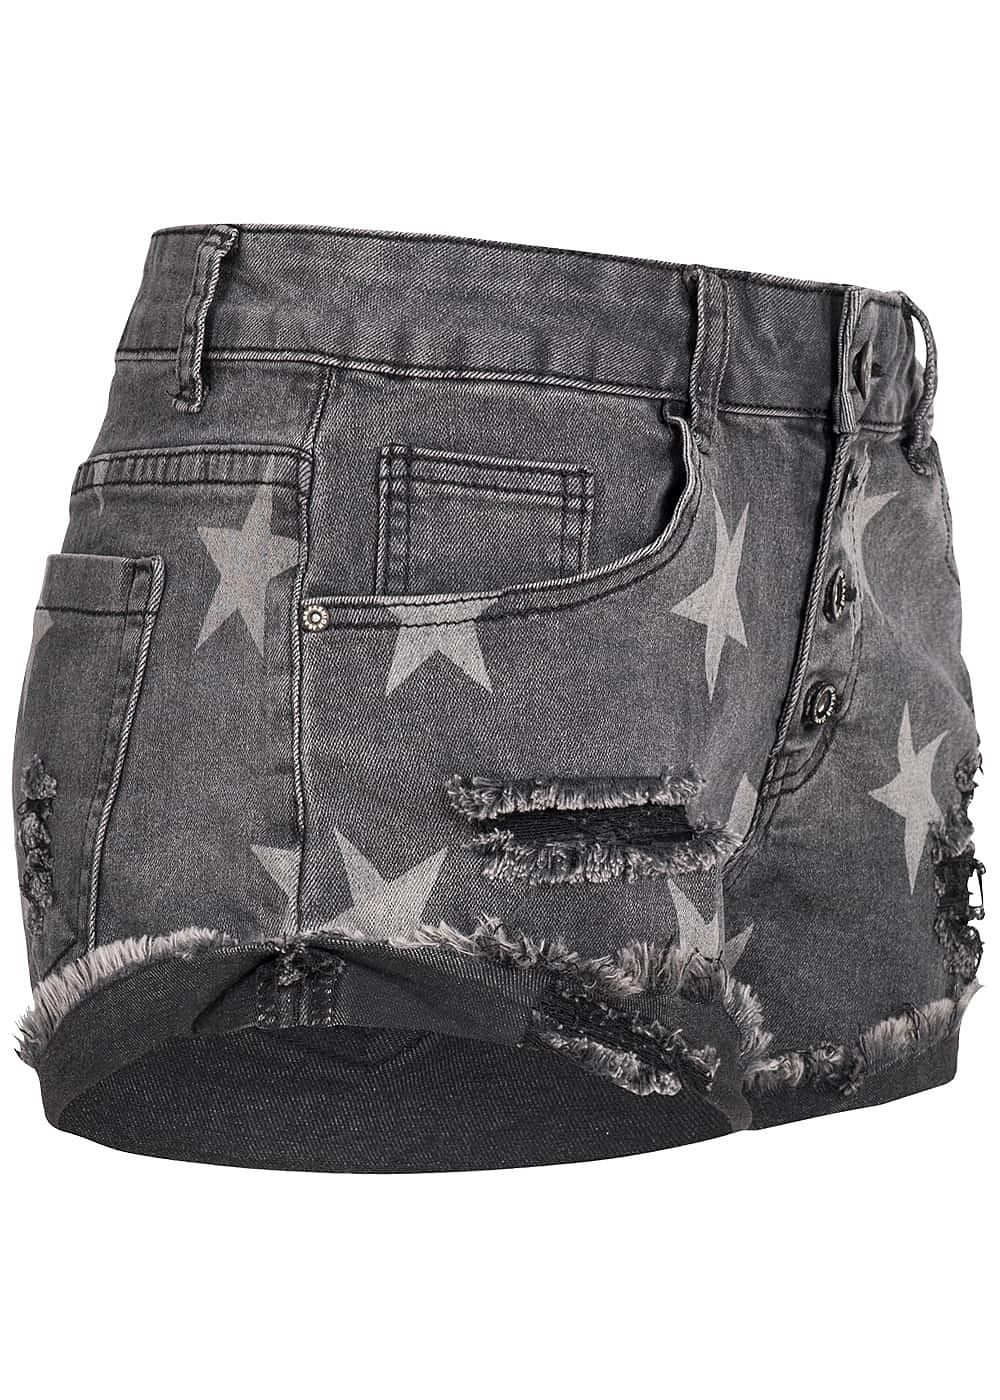 hailys damen jeans short sternen muster destroy look dunkel grau - Jeans Mit Muster